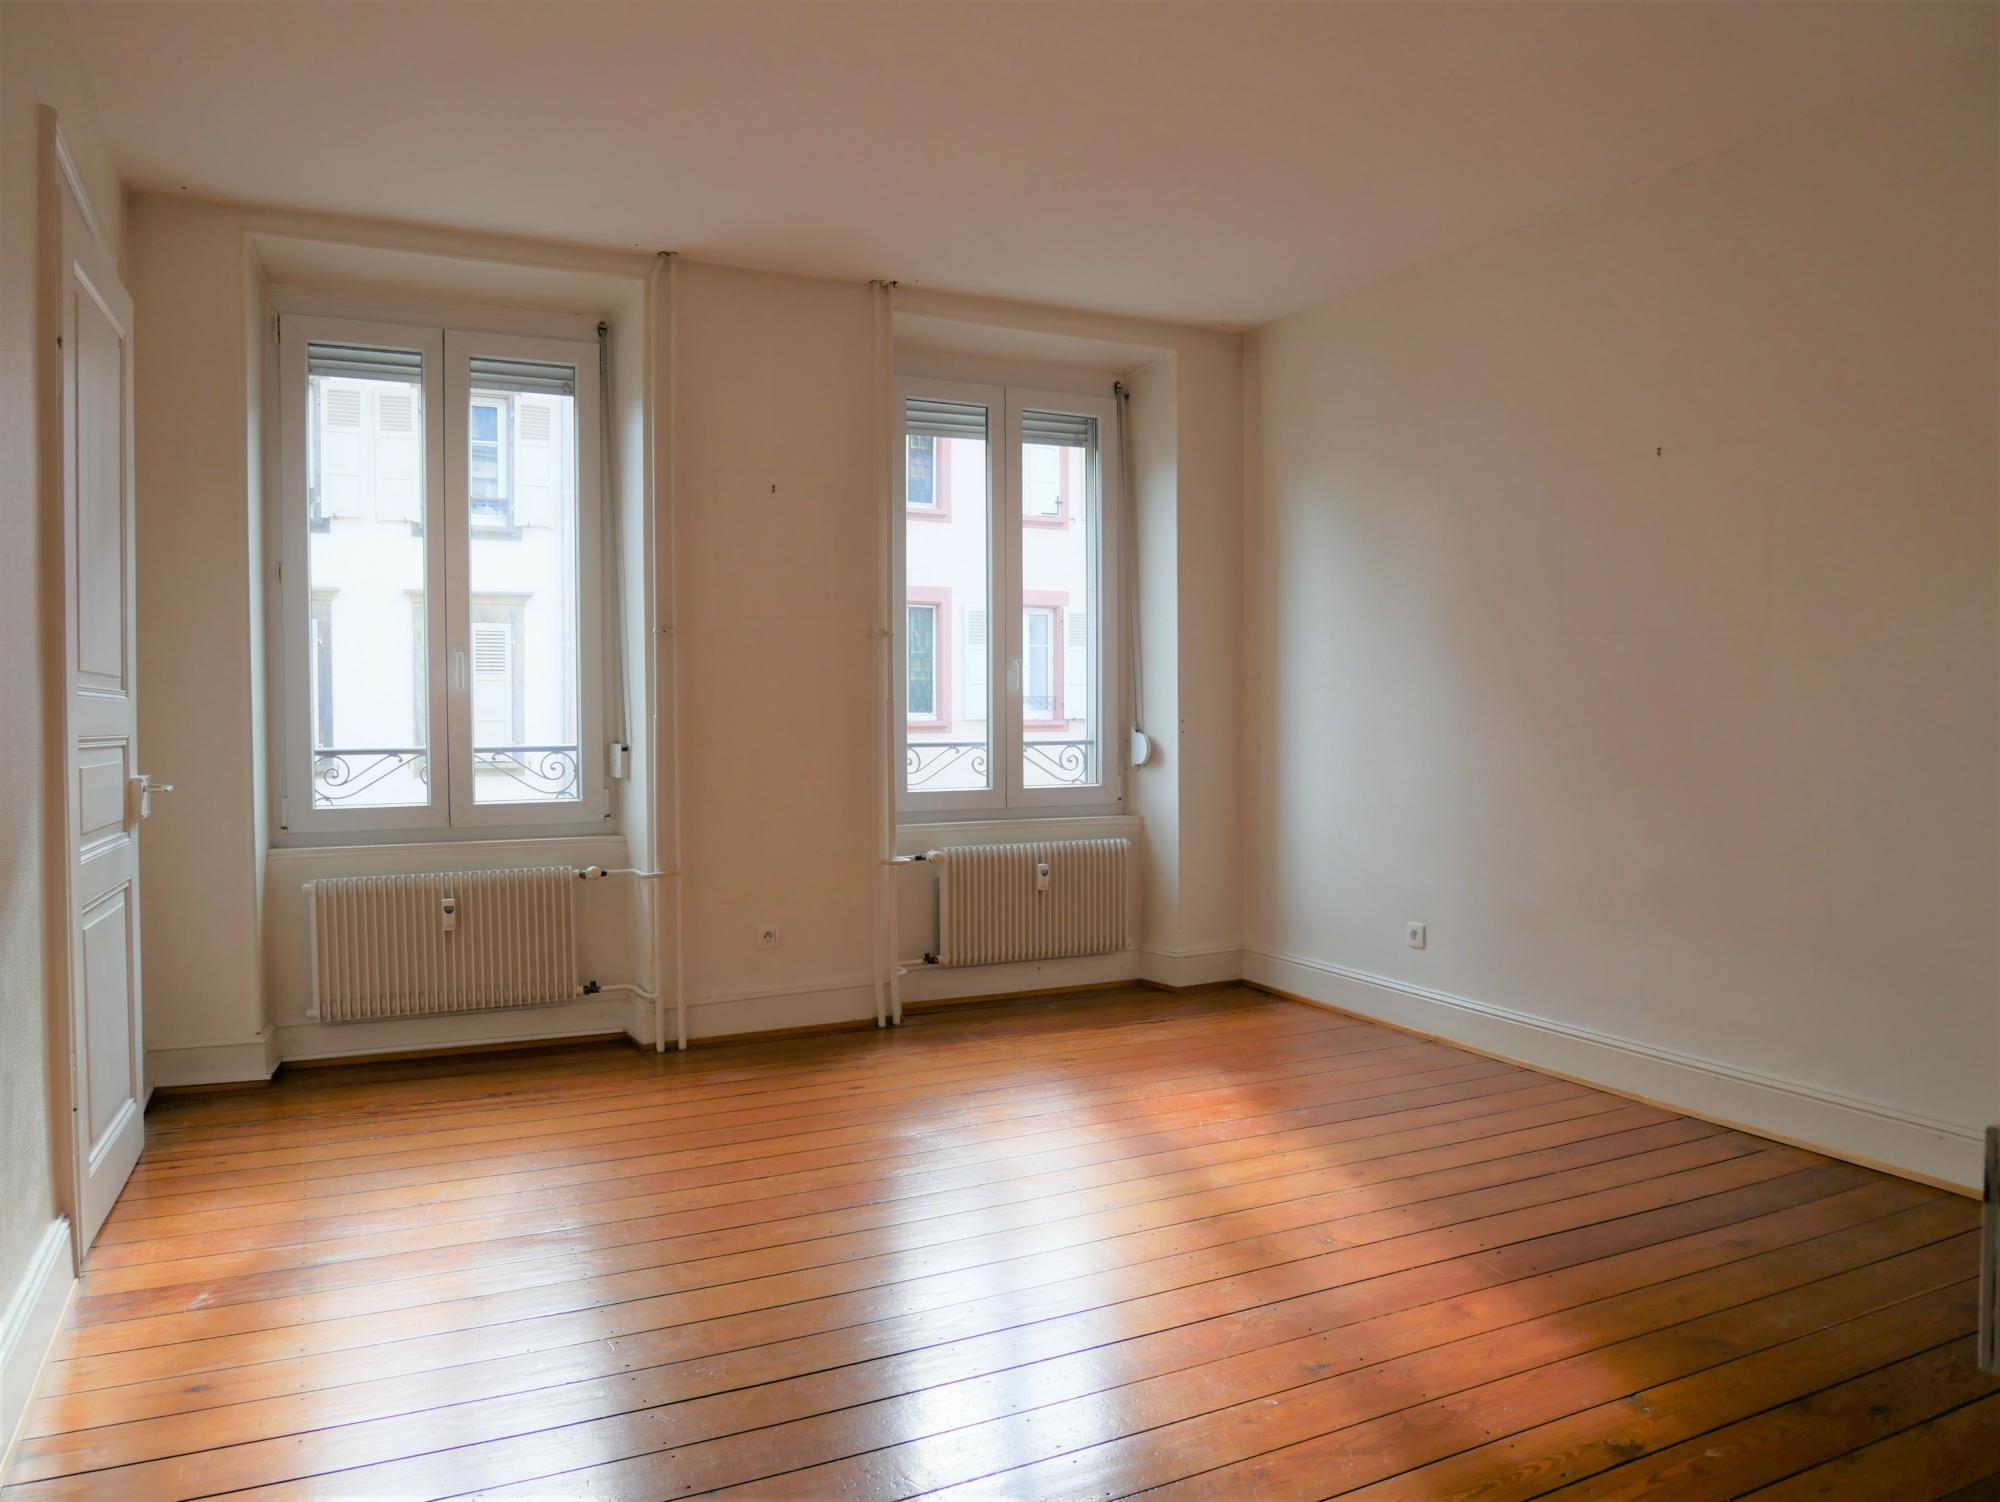 [Brownie] Lumineux 2 pièces - Musée d'Art Moderne / rue de Barr - nos locations - Beausite Immobilier 3